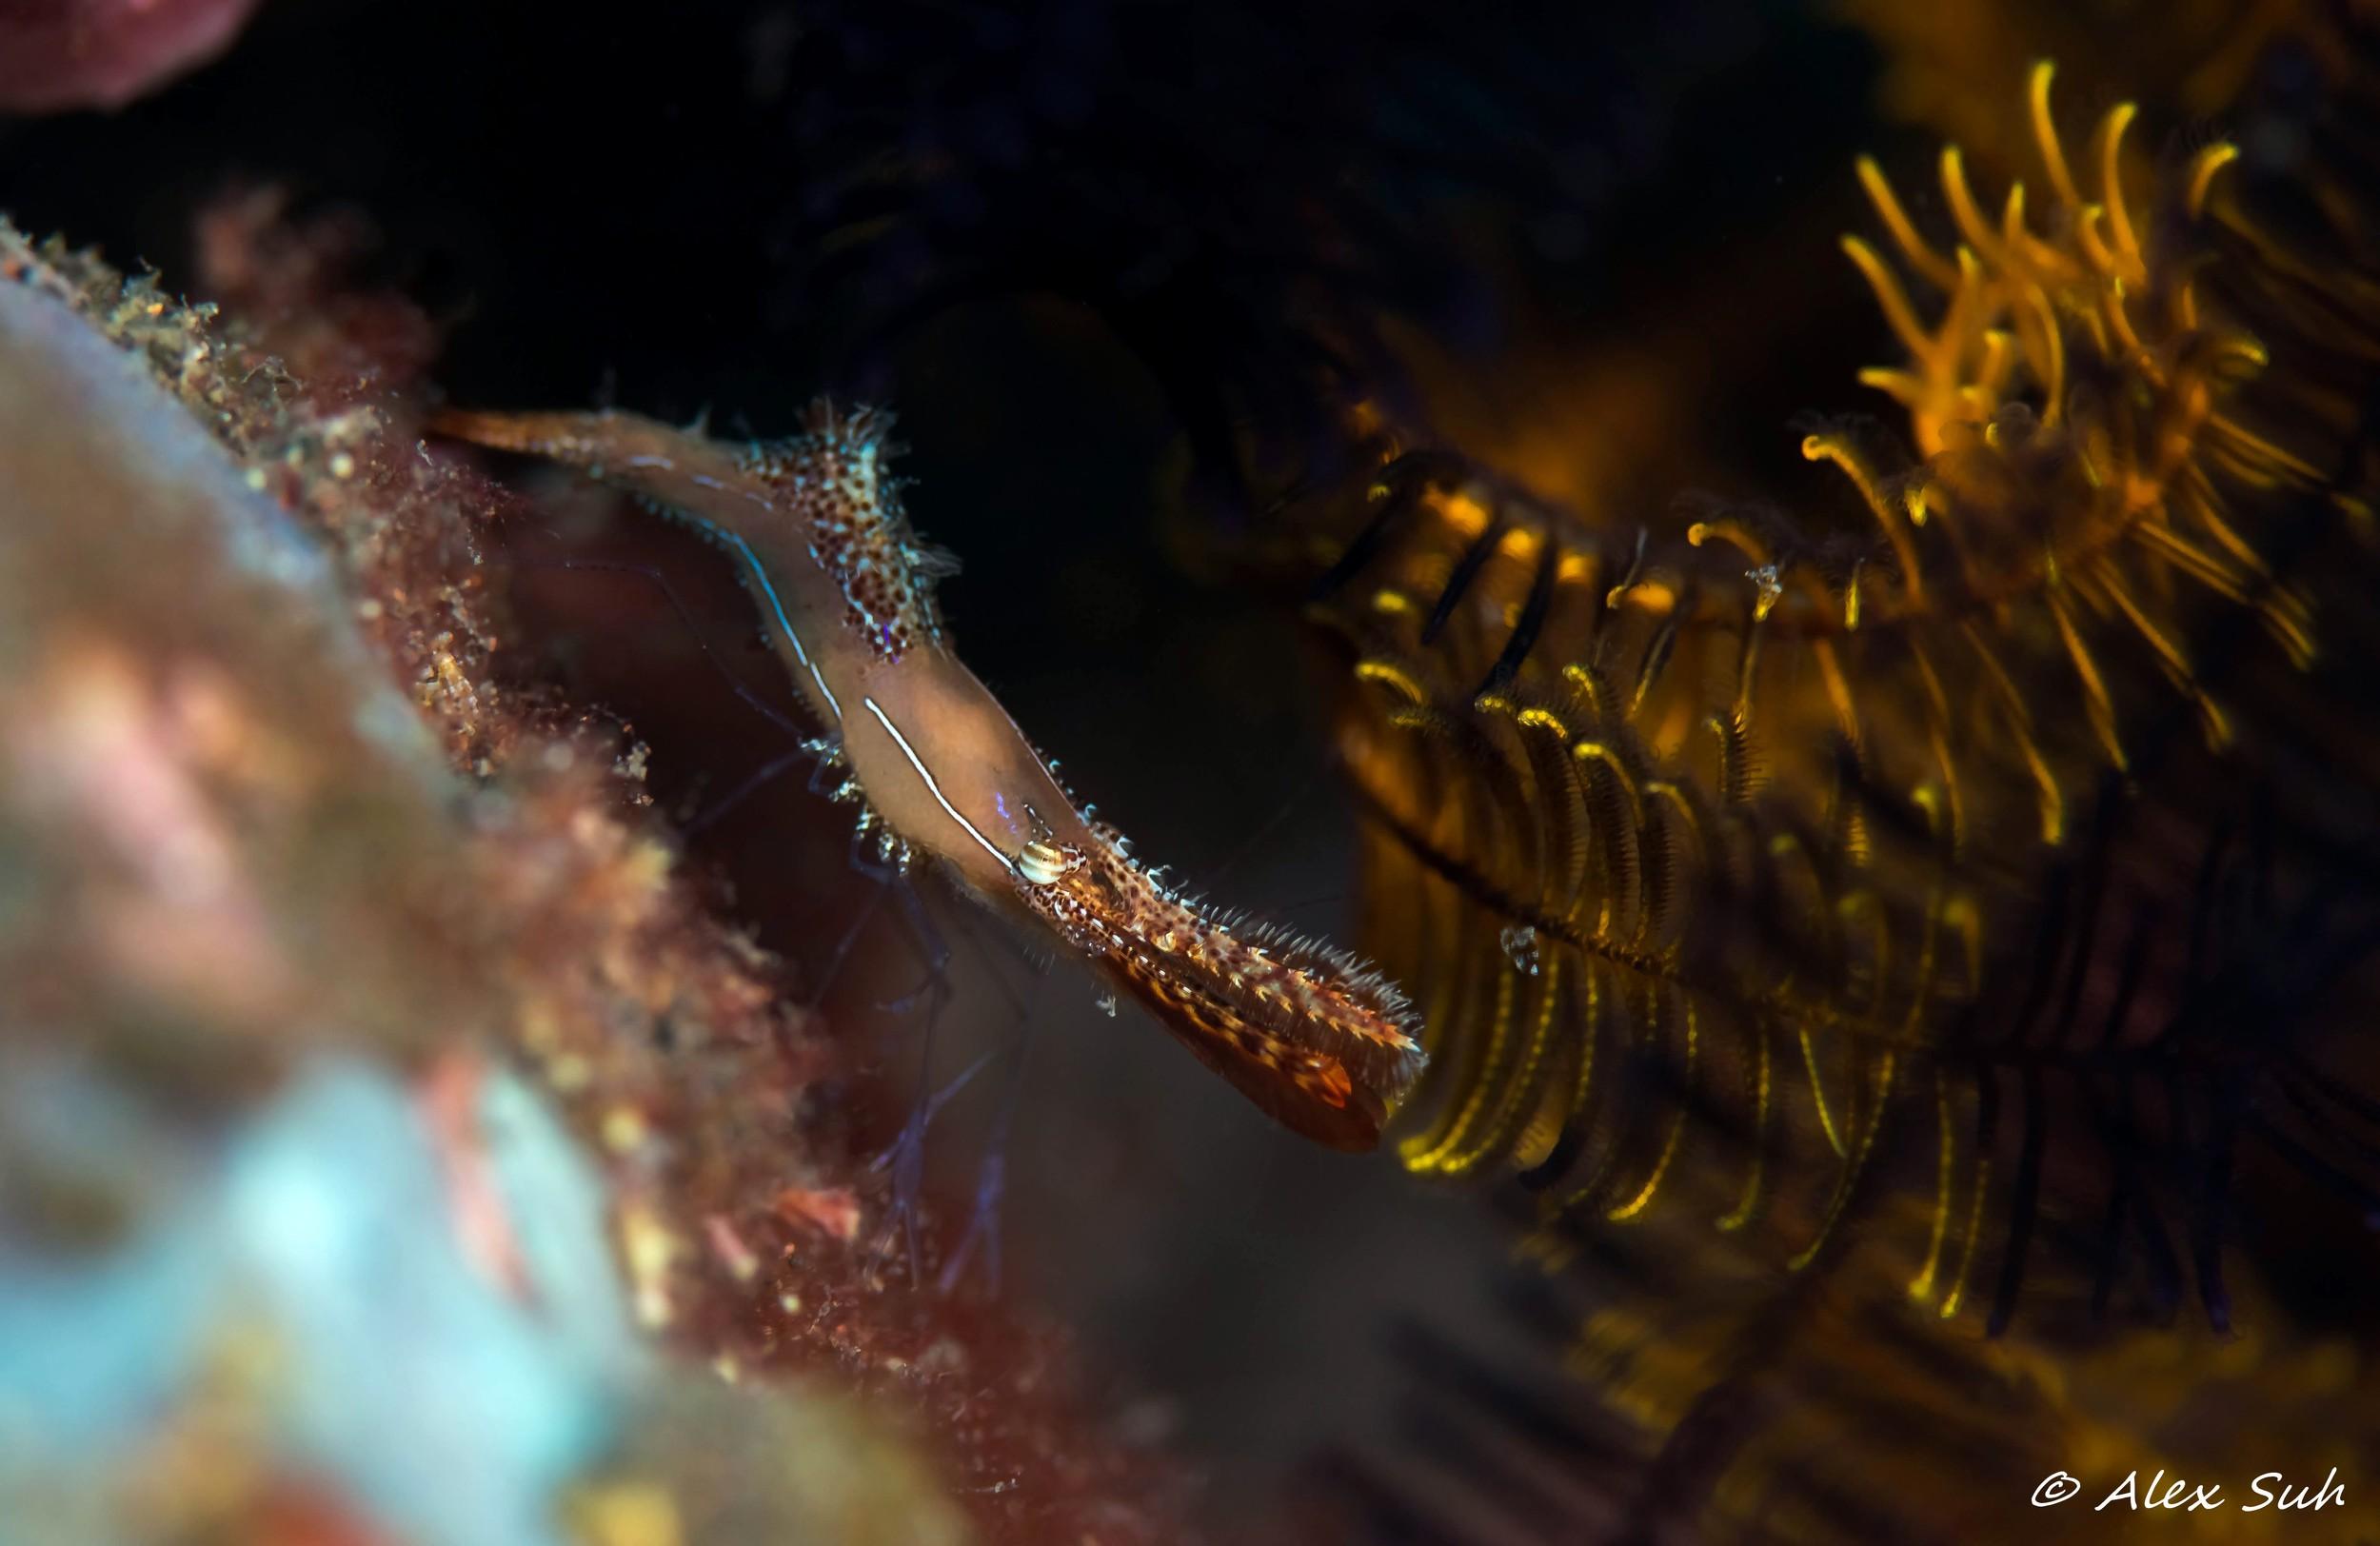 Long Nose Rock Shrimp (Leander plumosus)